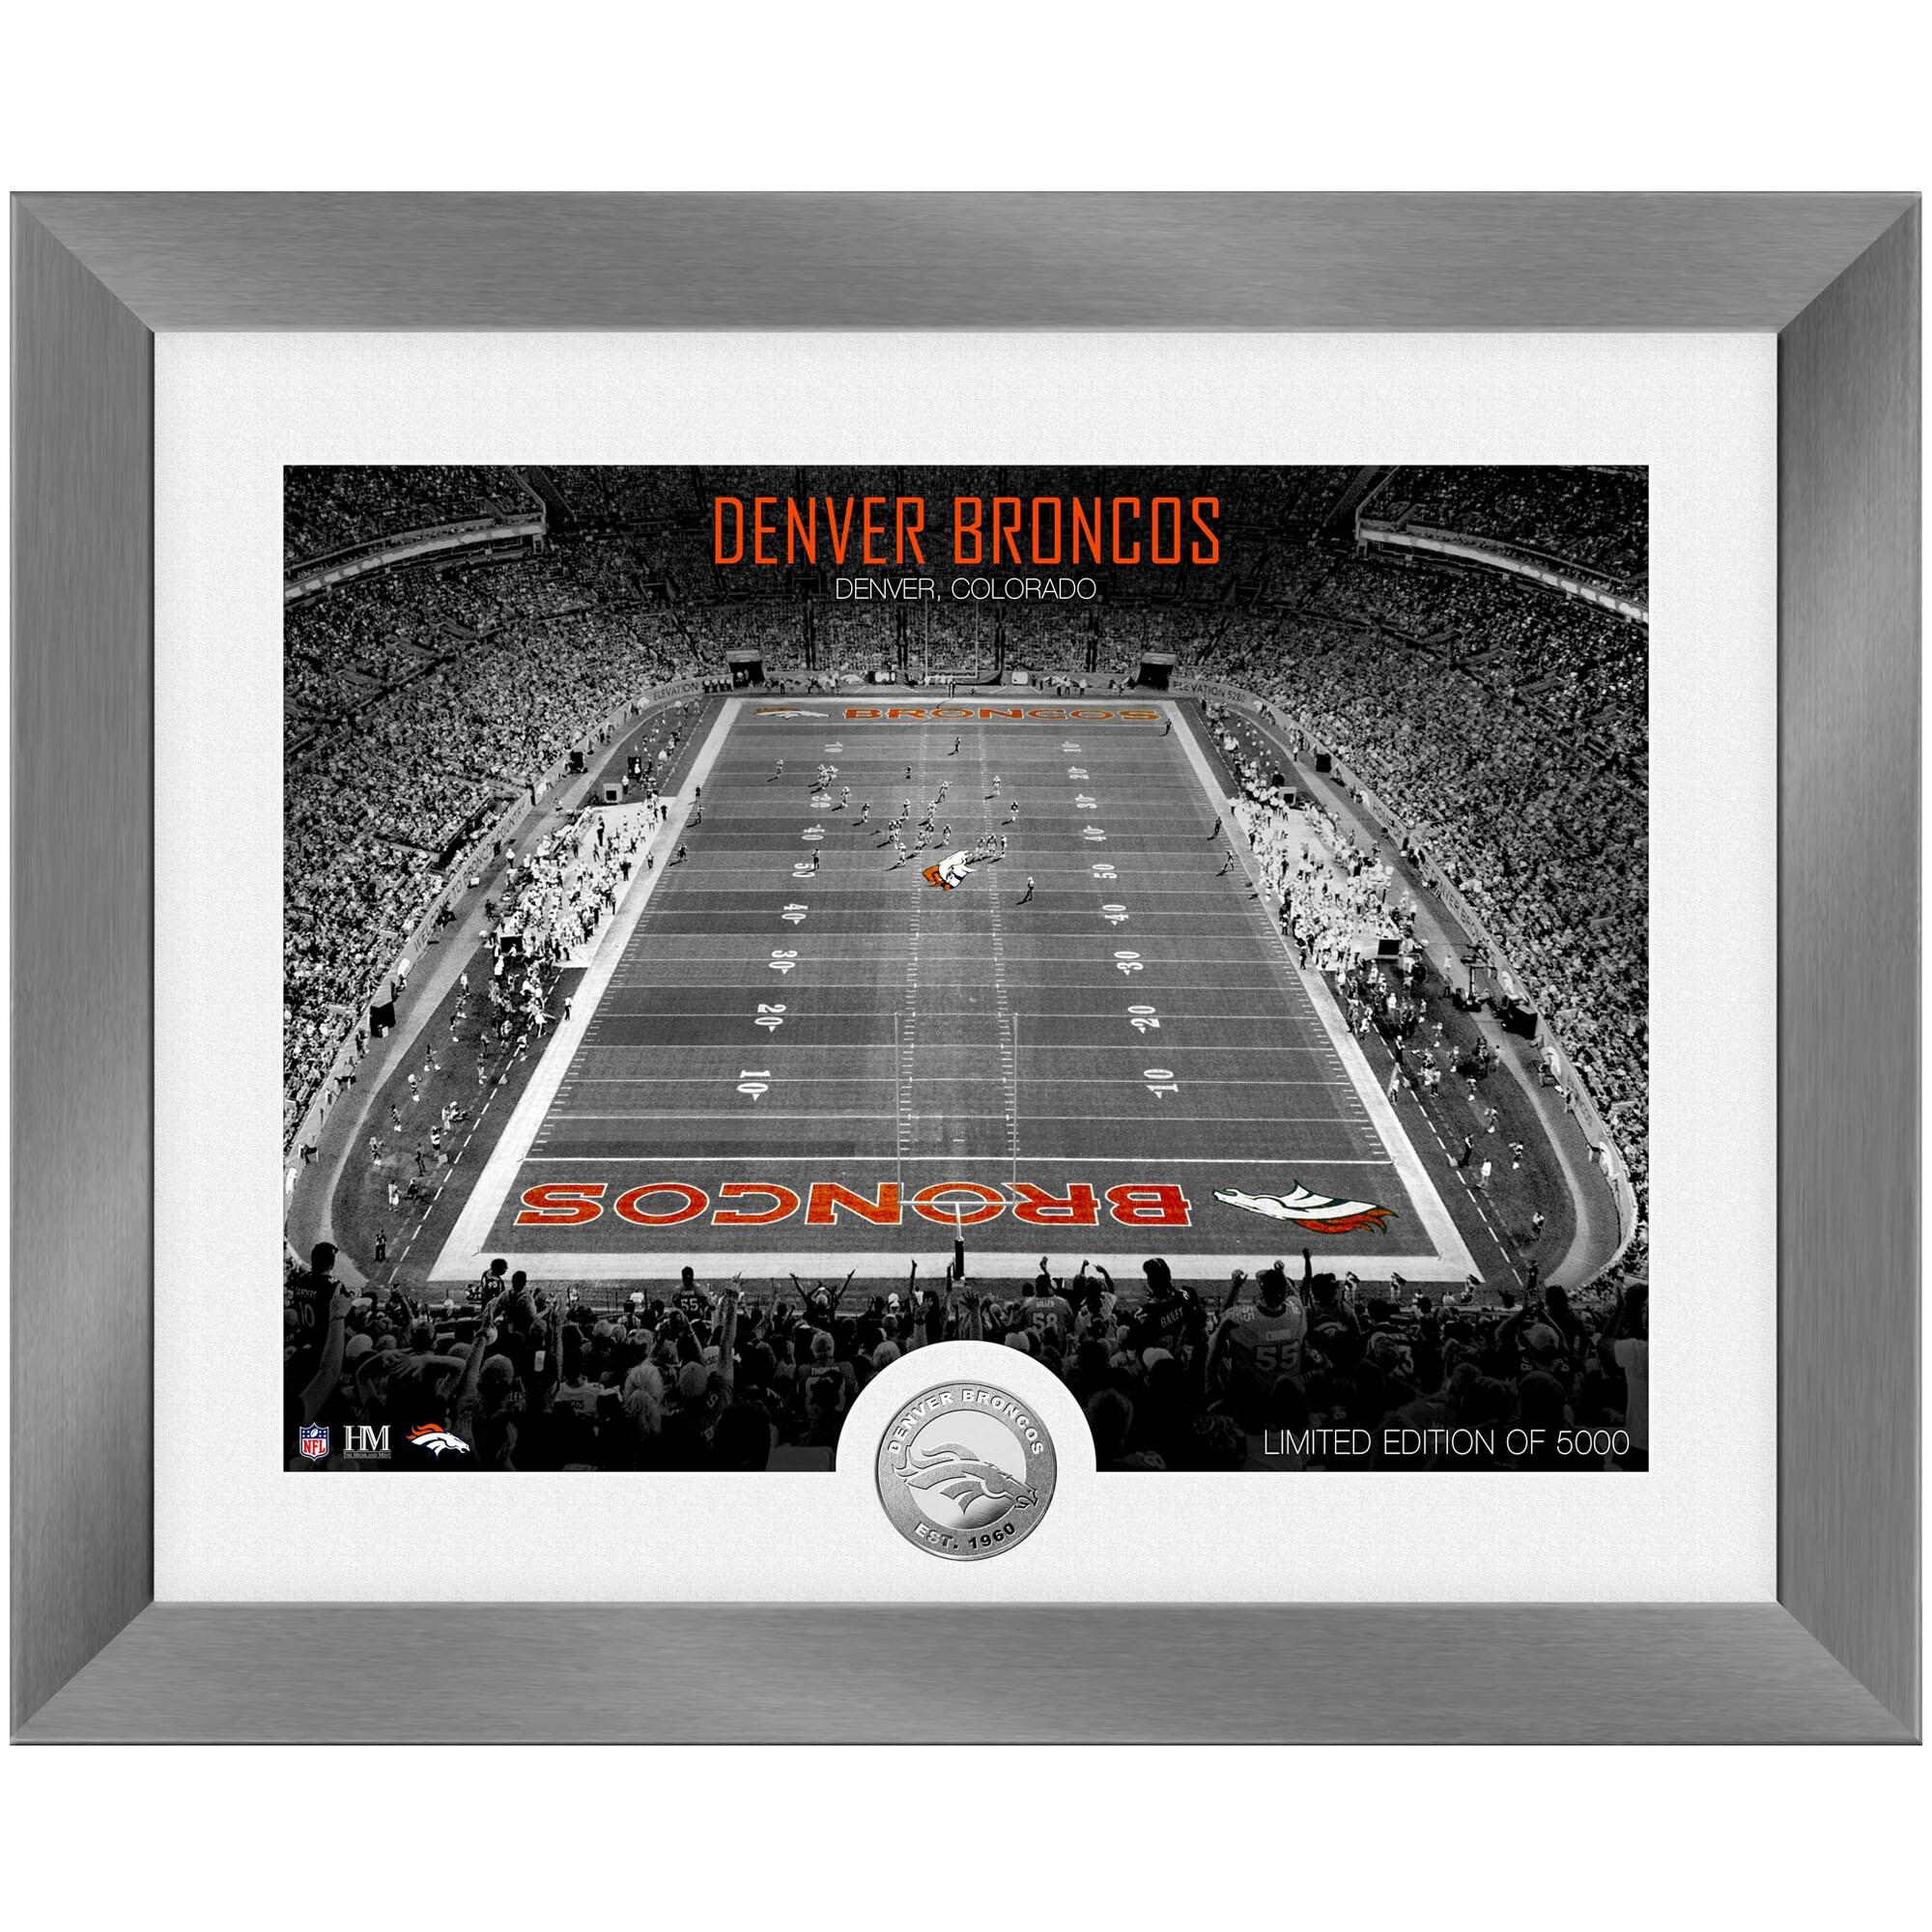 Denver Broncos Highland Mint 13'' x 16'' Art Deco Stadium Silver Coin Photo Mint